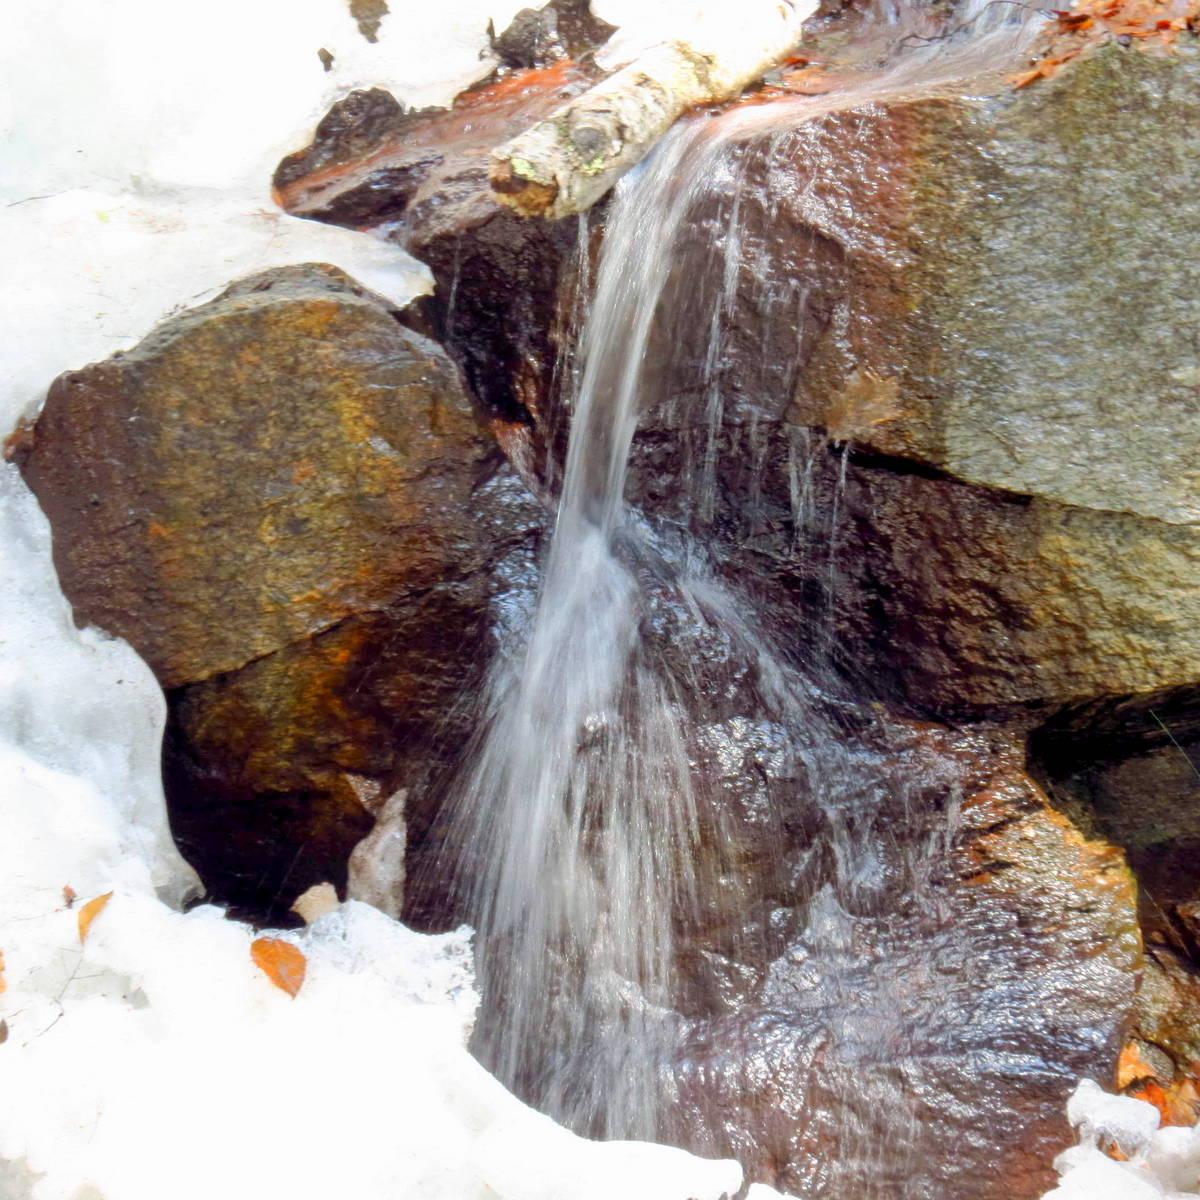 3. Falling Water